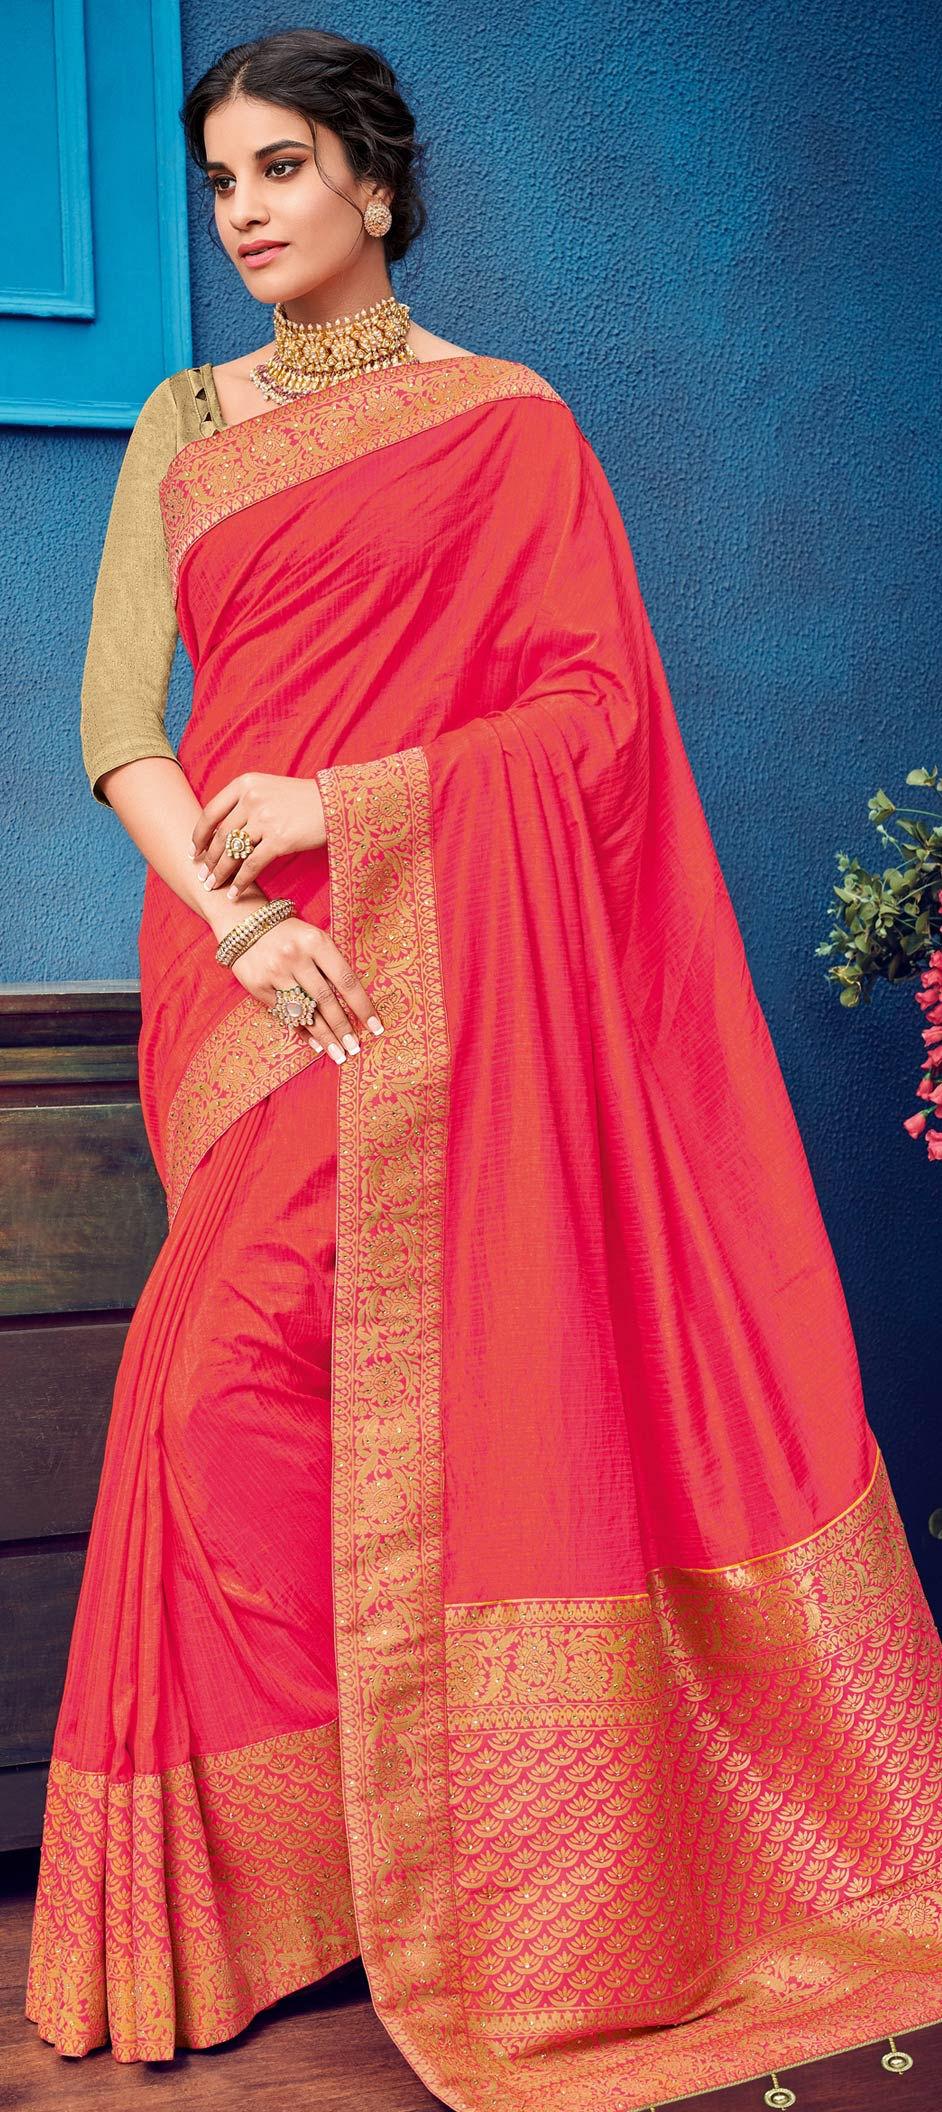 Rock the wedding season with these latest designer sarees